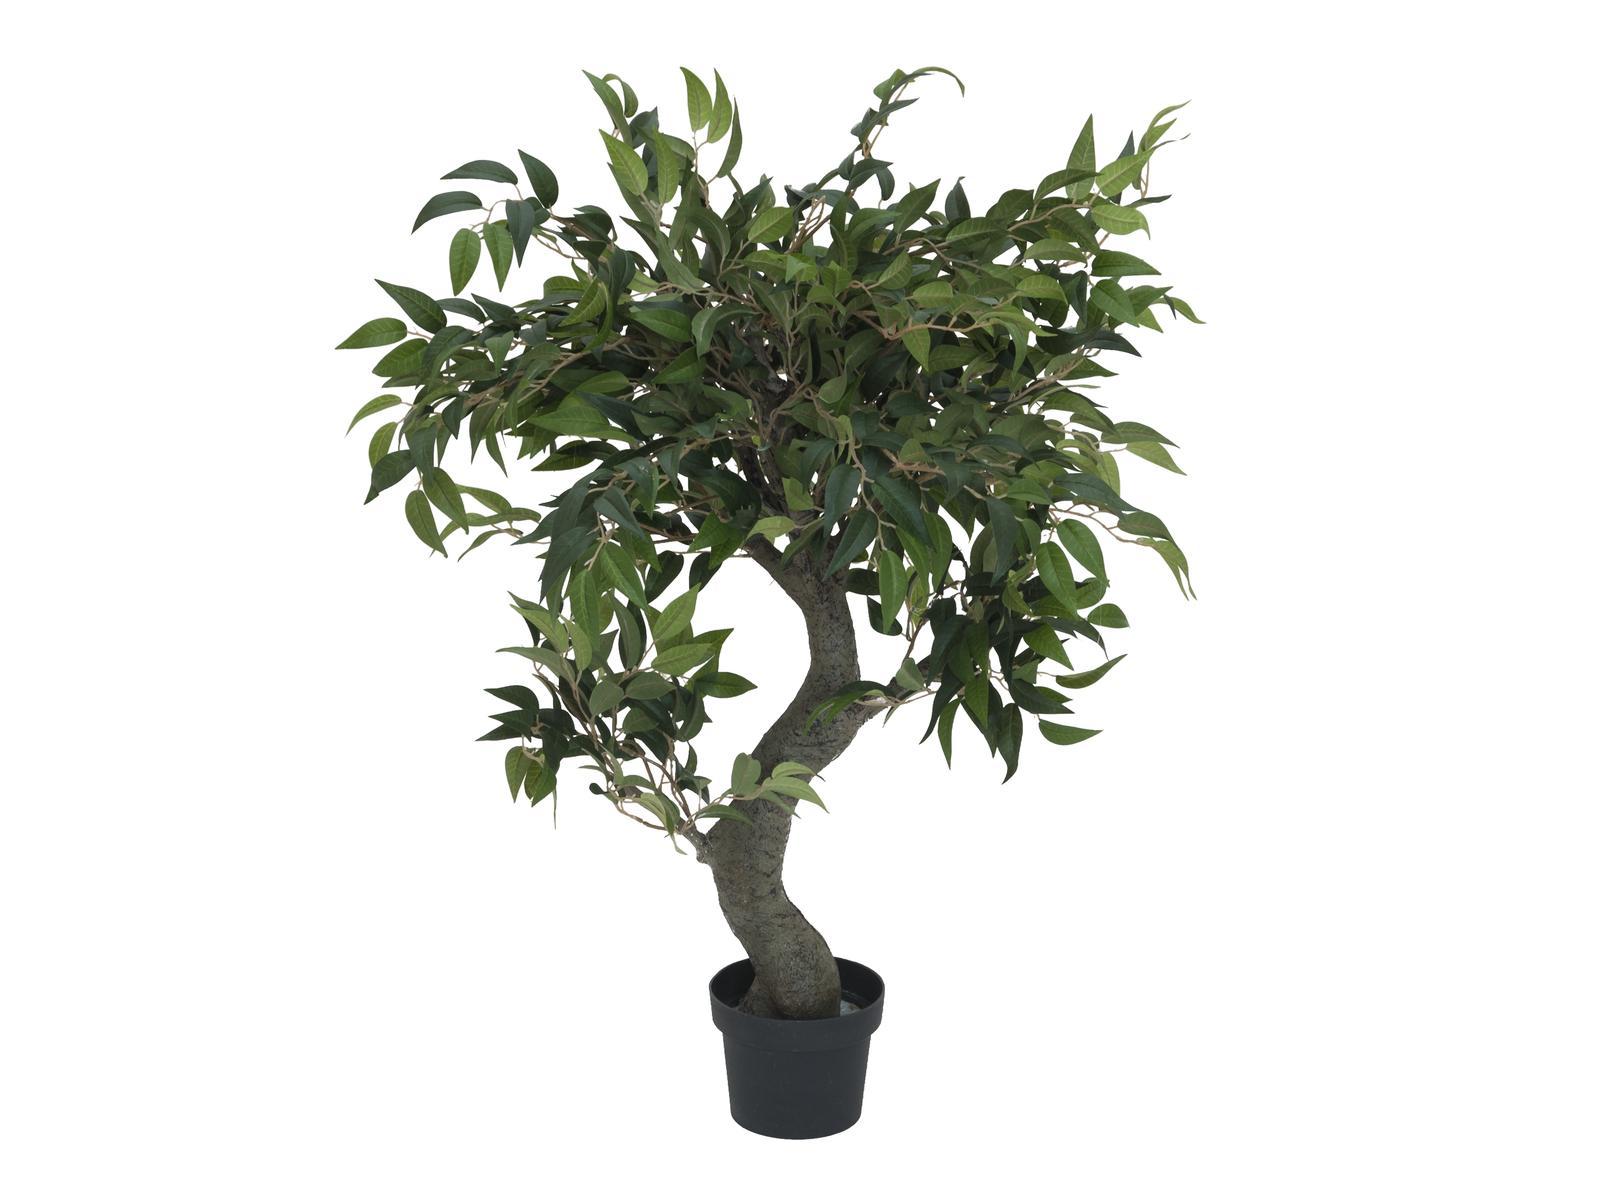 EUROPALMS Ficus Waldbaum, Kunstpflanze, 80cm